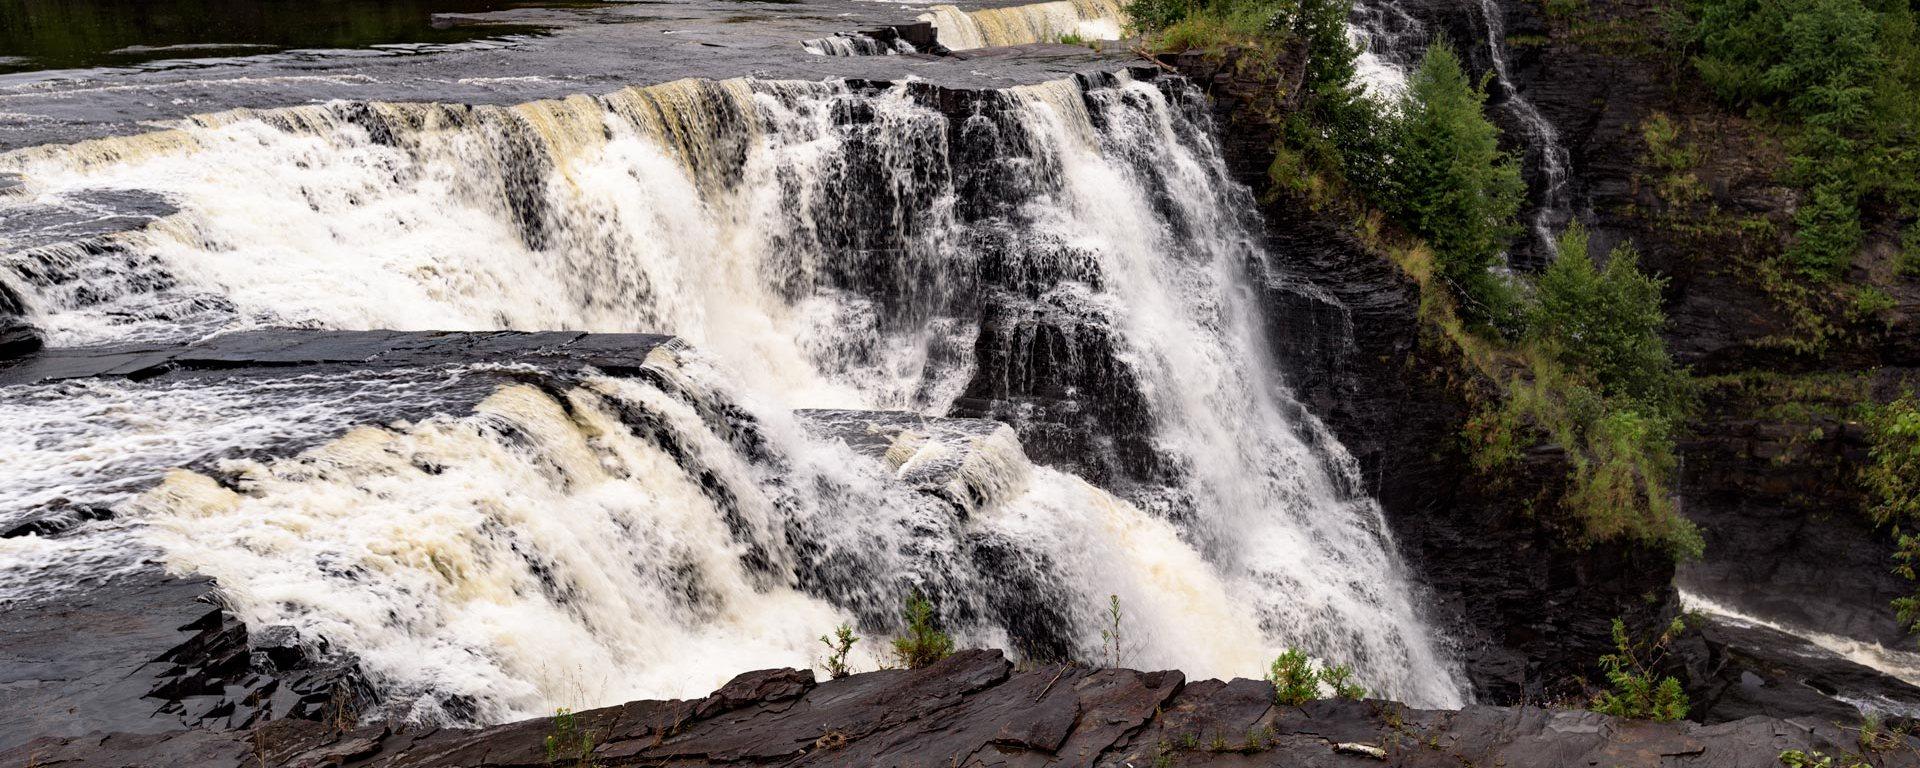 Kaministiquia River, kakabeka Falls, Ontario, waterfall, travel, adventure, hiking, nature, wanderlust, legend, sacrifice